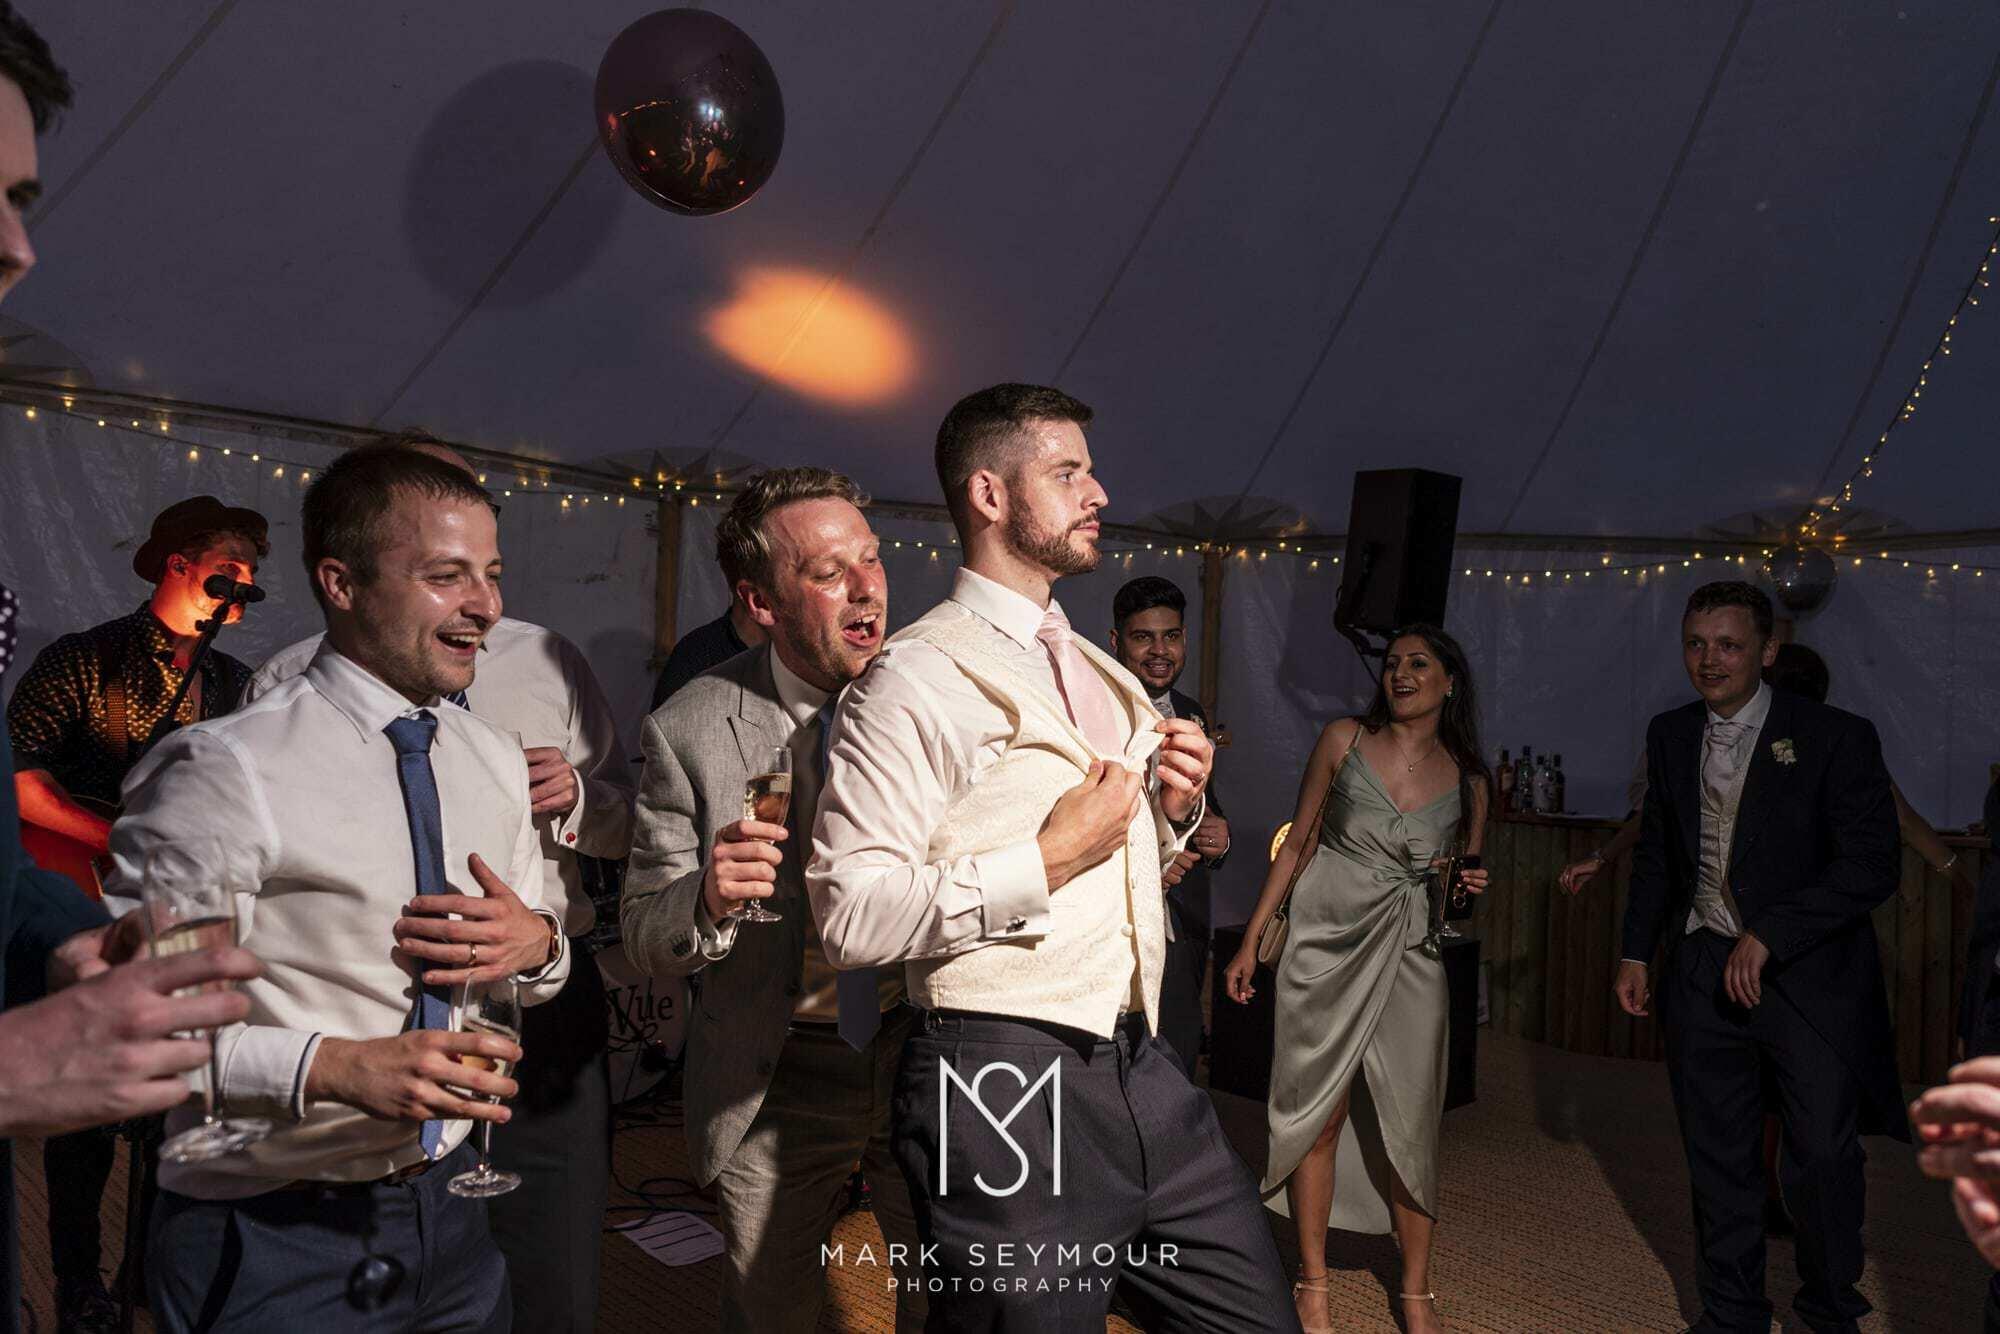 Barnsley House Wedding Photographer - Olivia and James' wedding 33